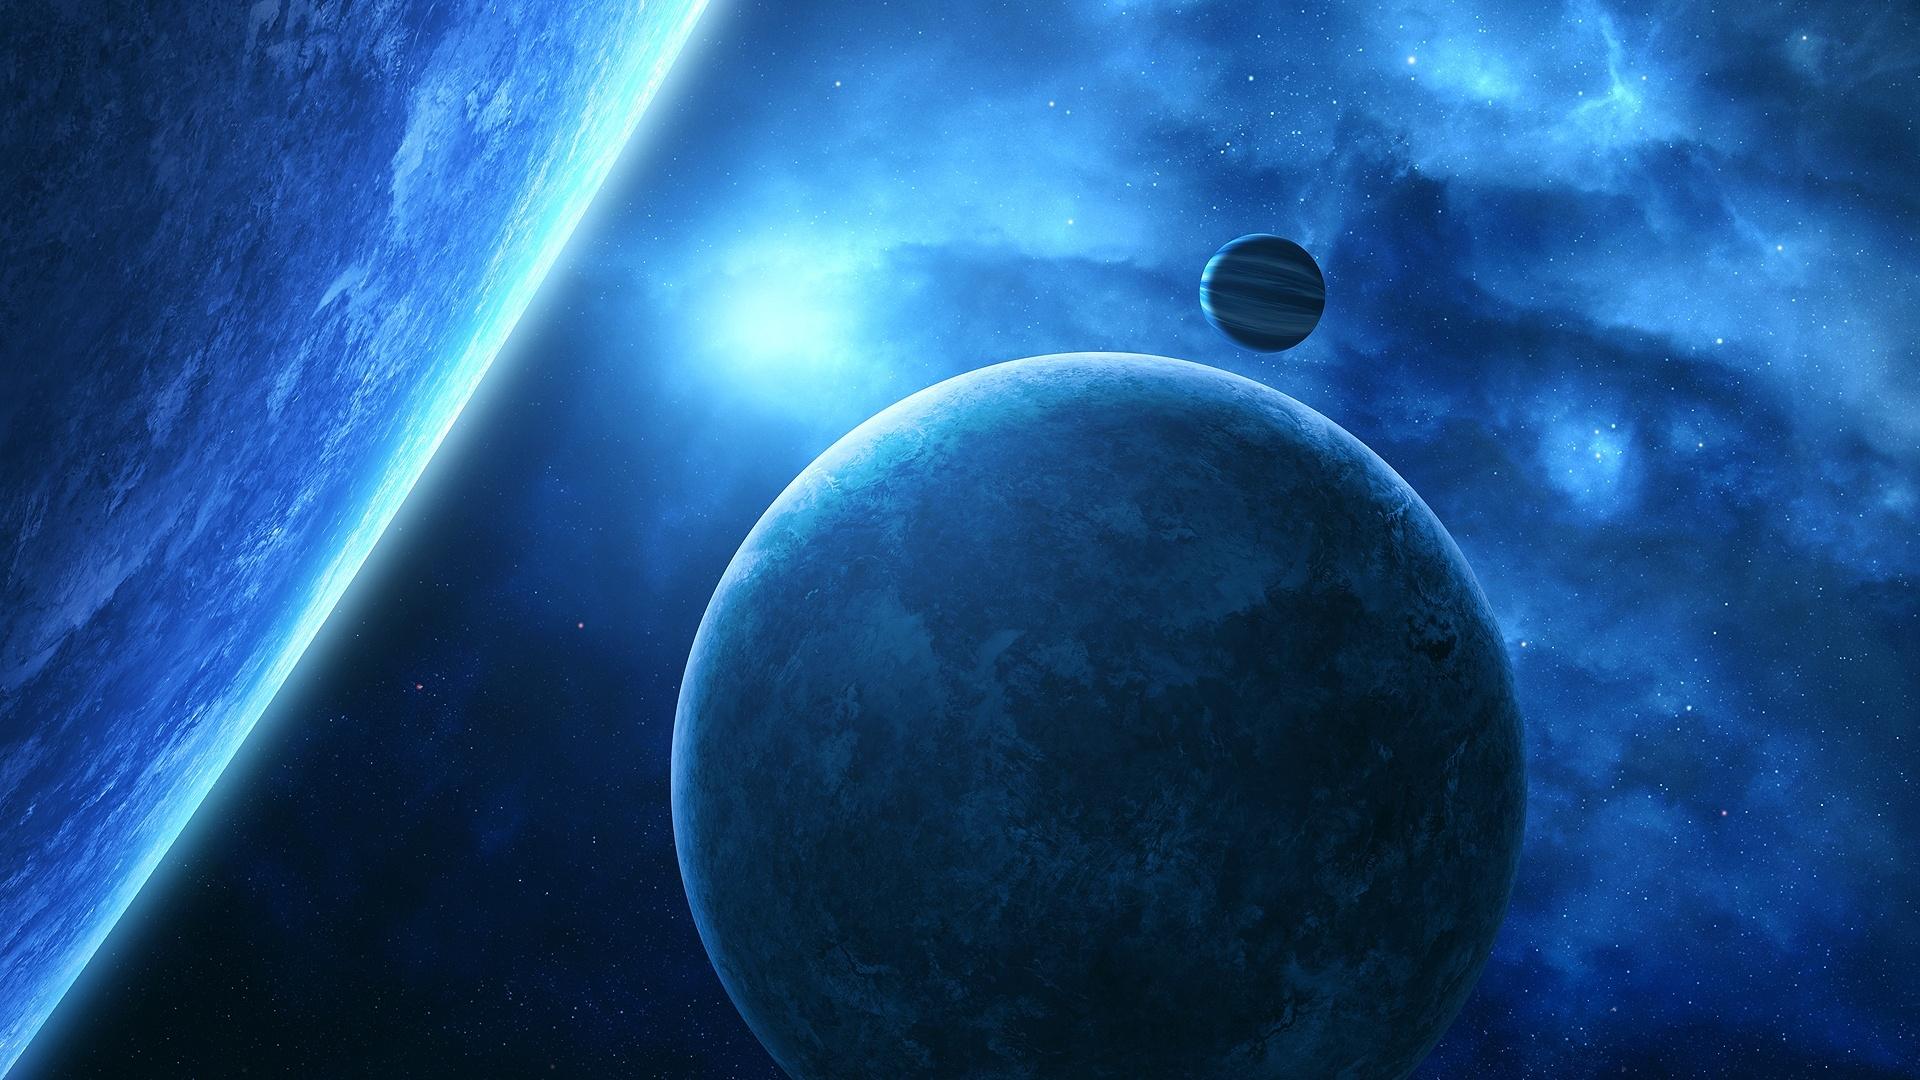 1080 x 1920 moon wallpaper: Space Planets Moon Nebula Wallpapers